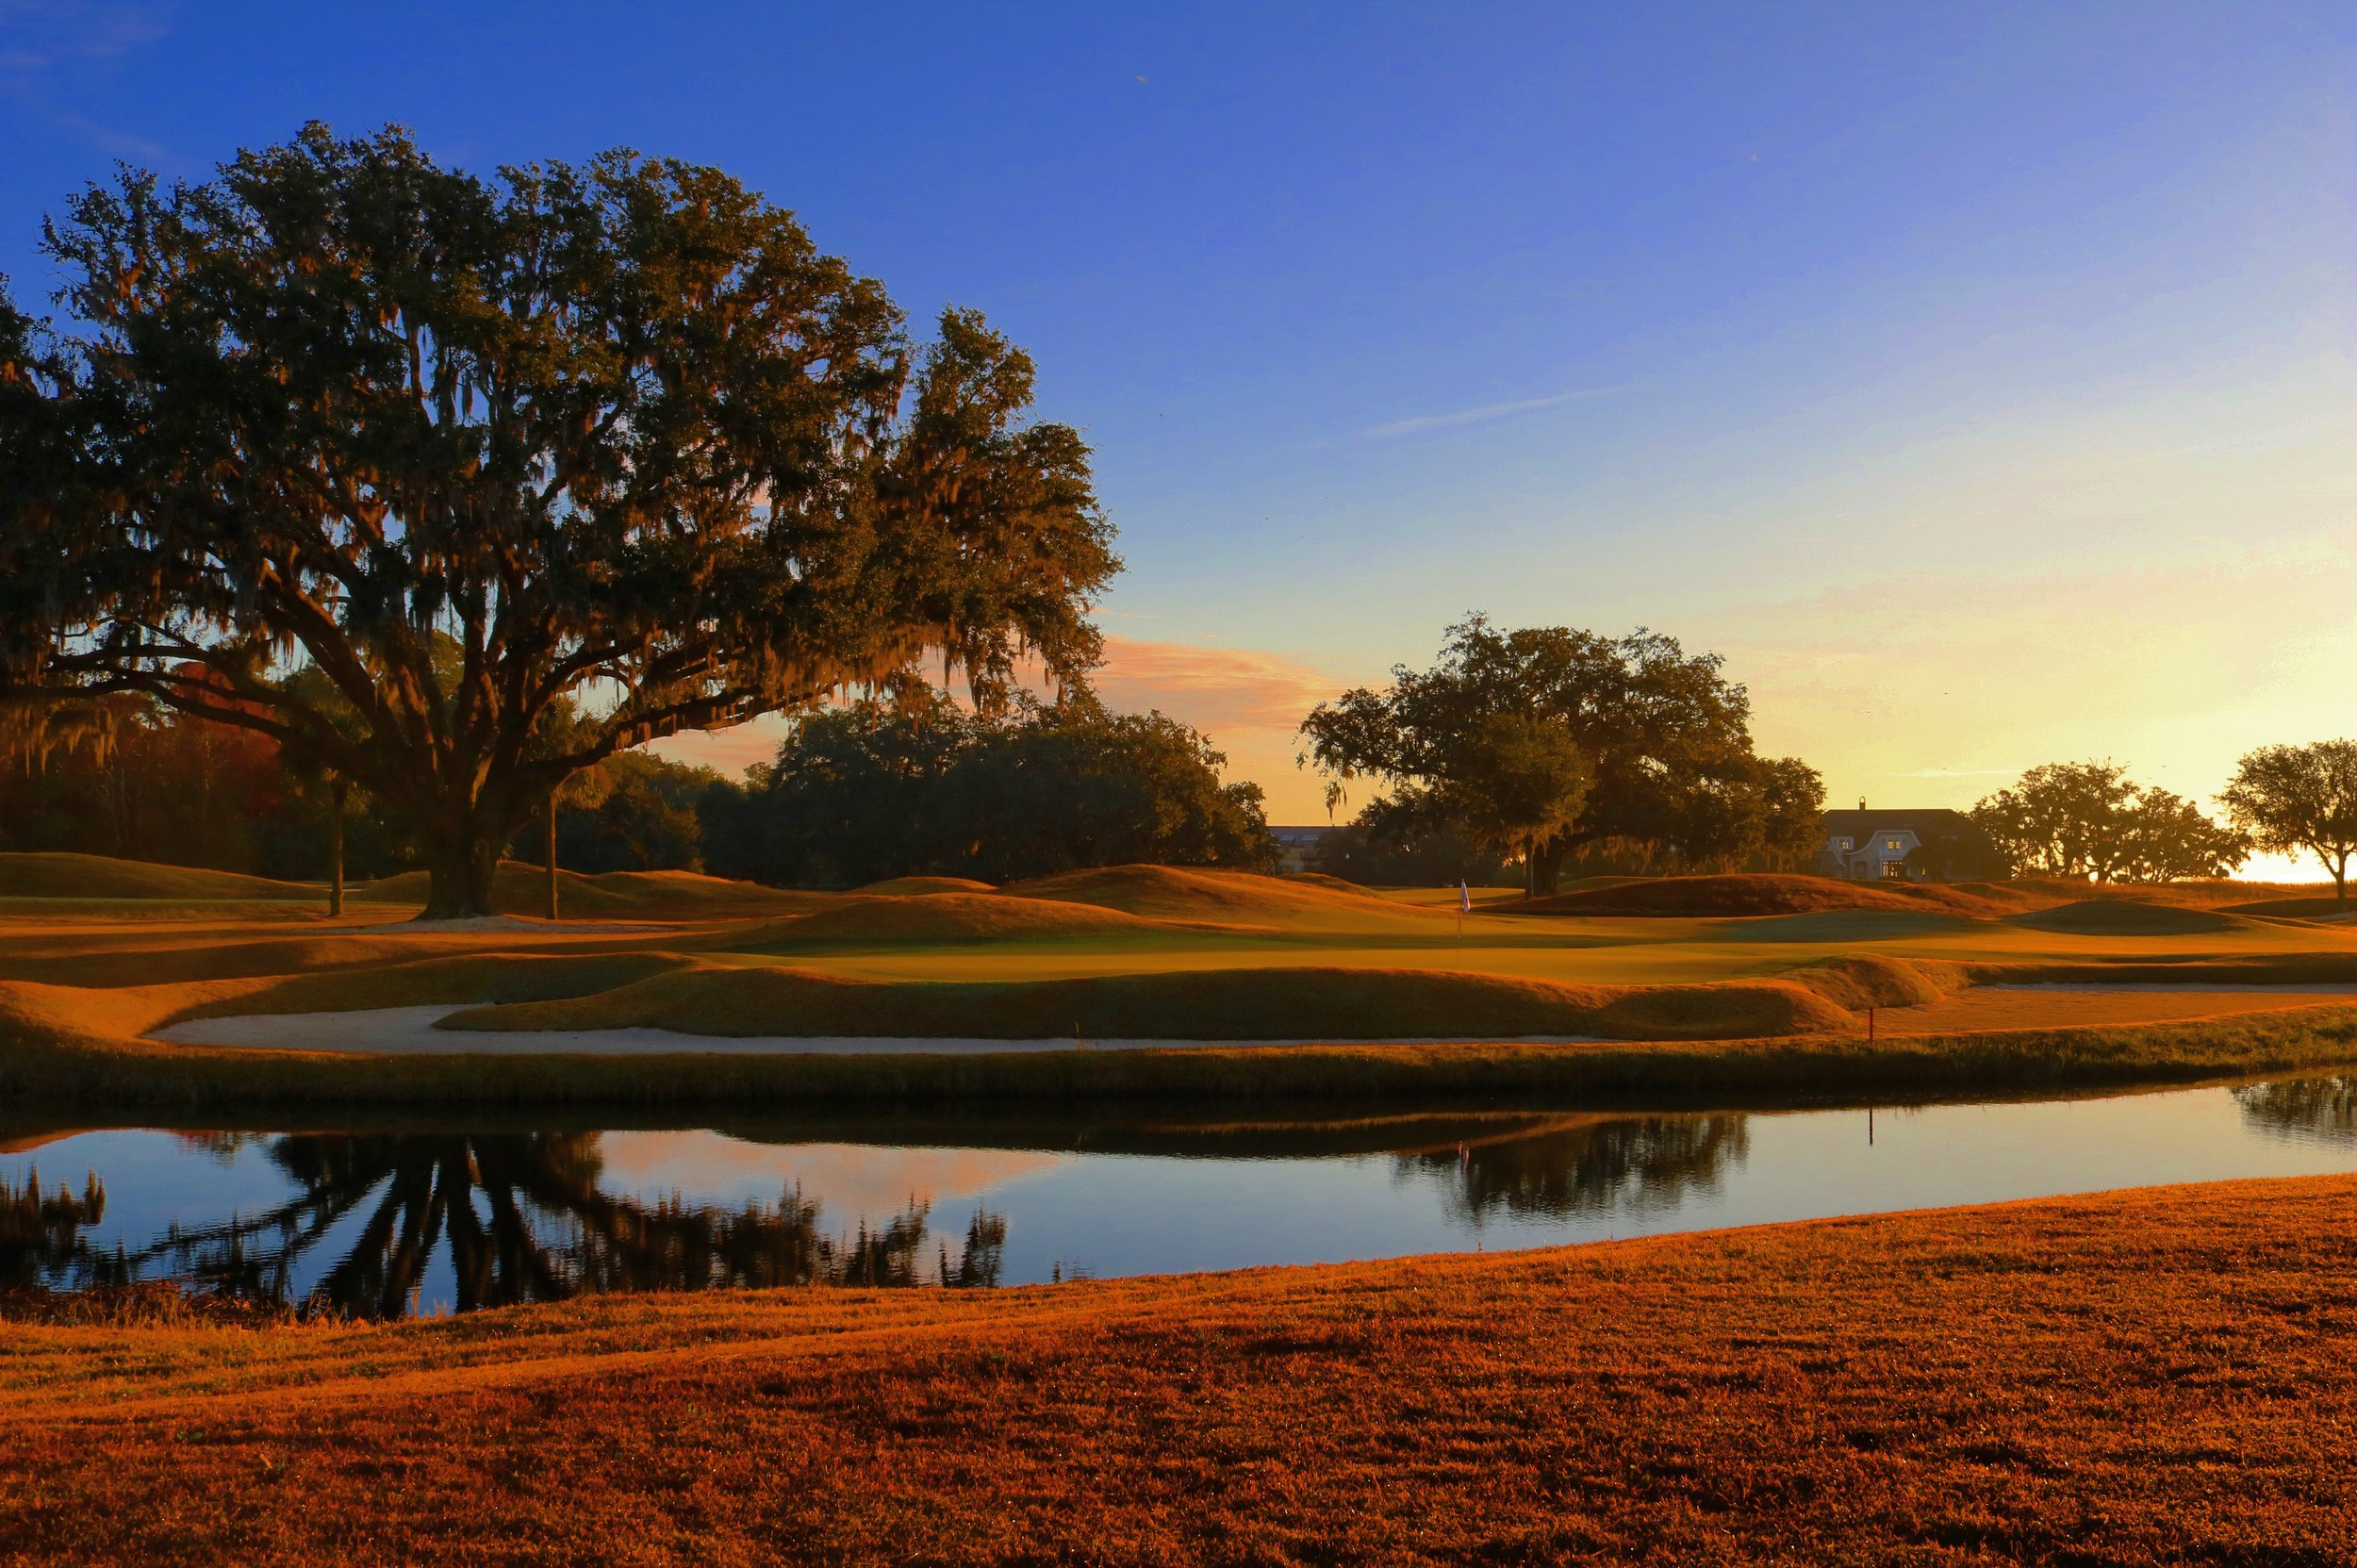 Golf Hole #10